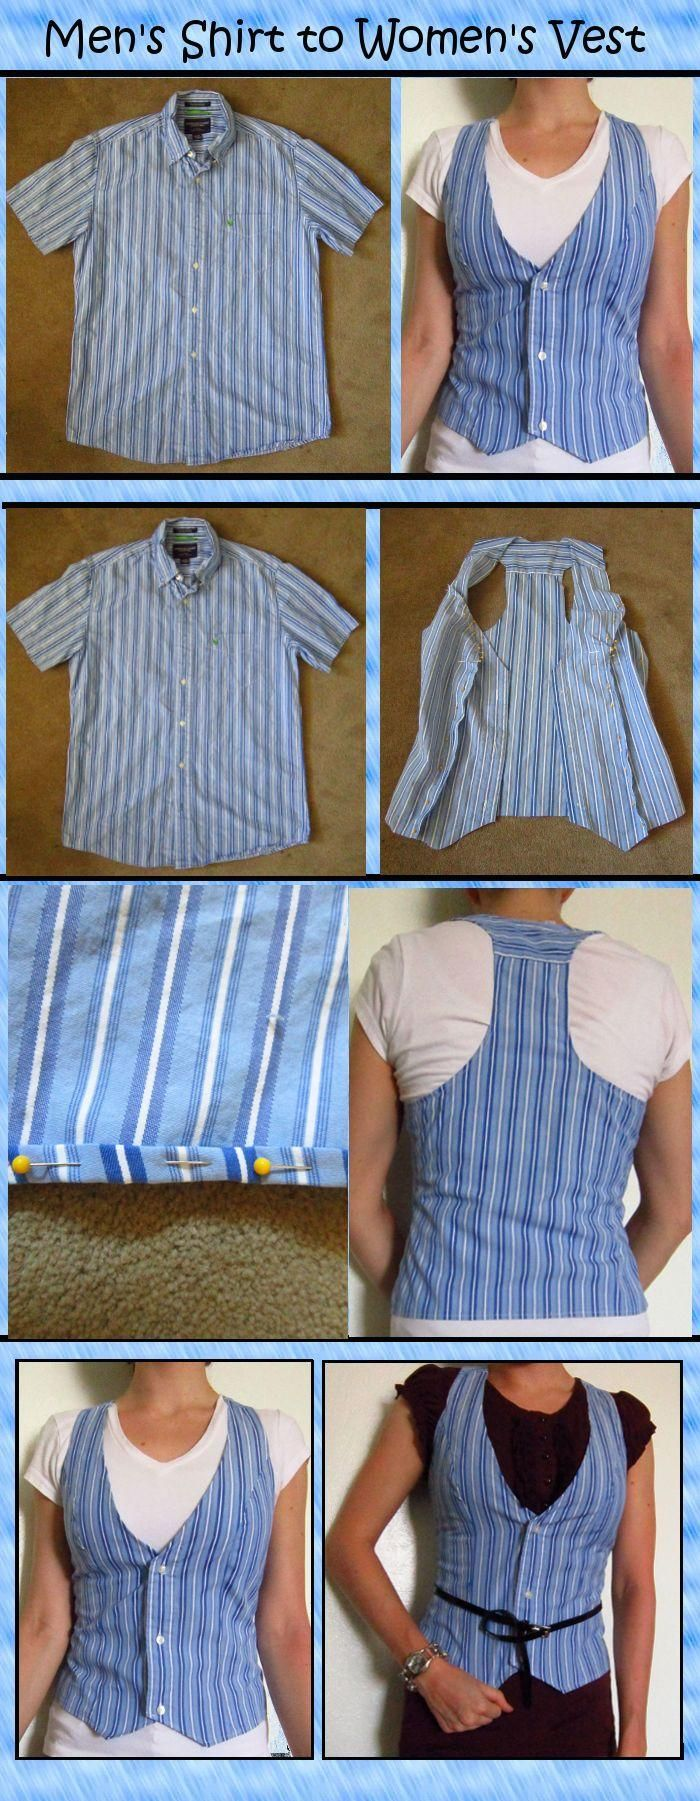 #men #shirt #to #women #vest #howto #tutorial #stepbystep